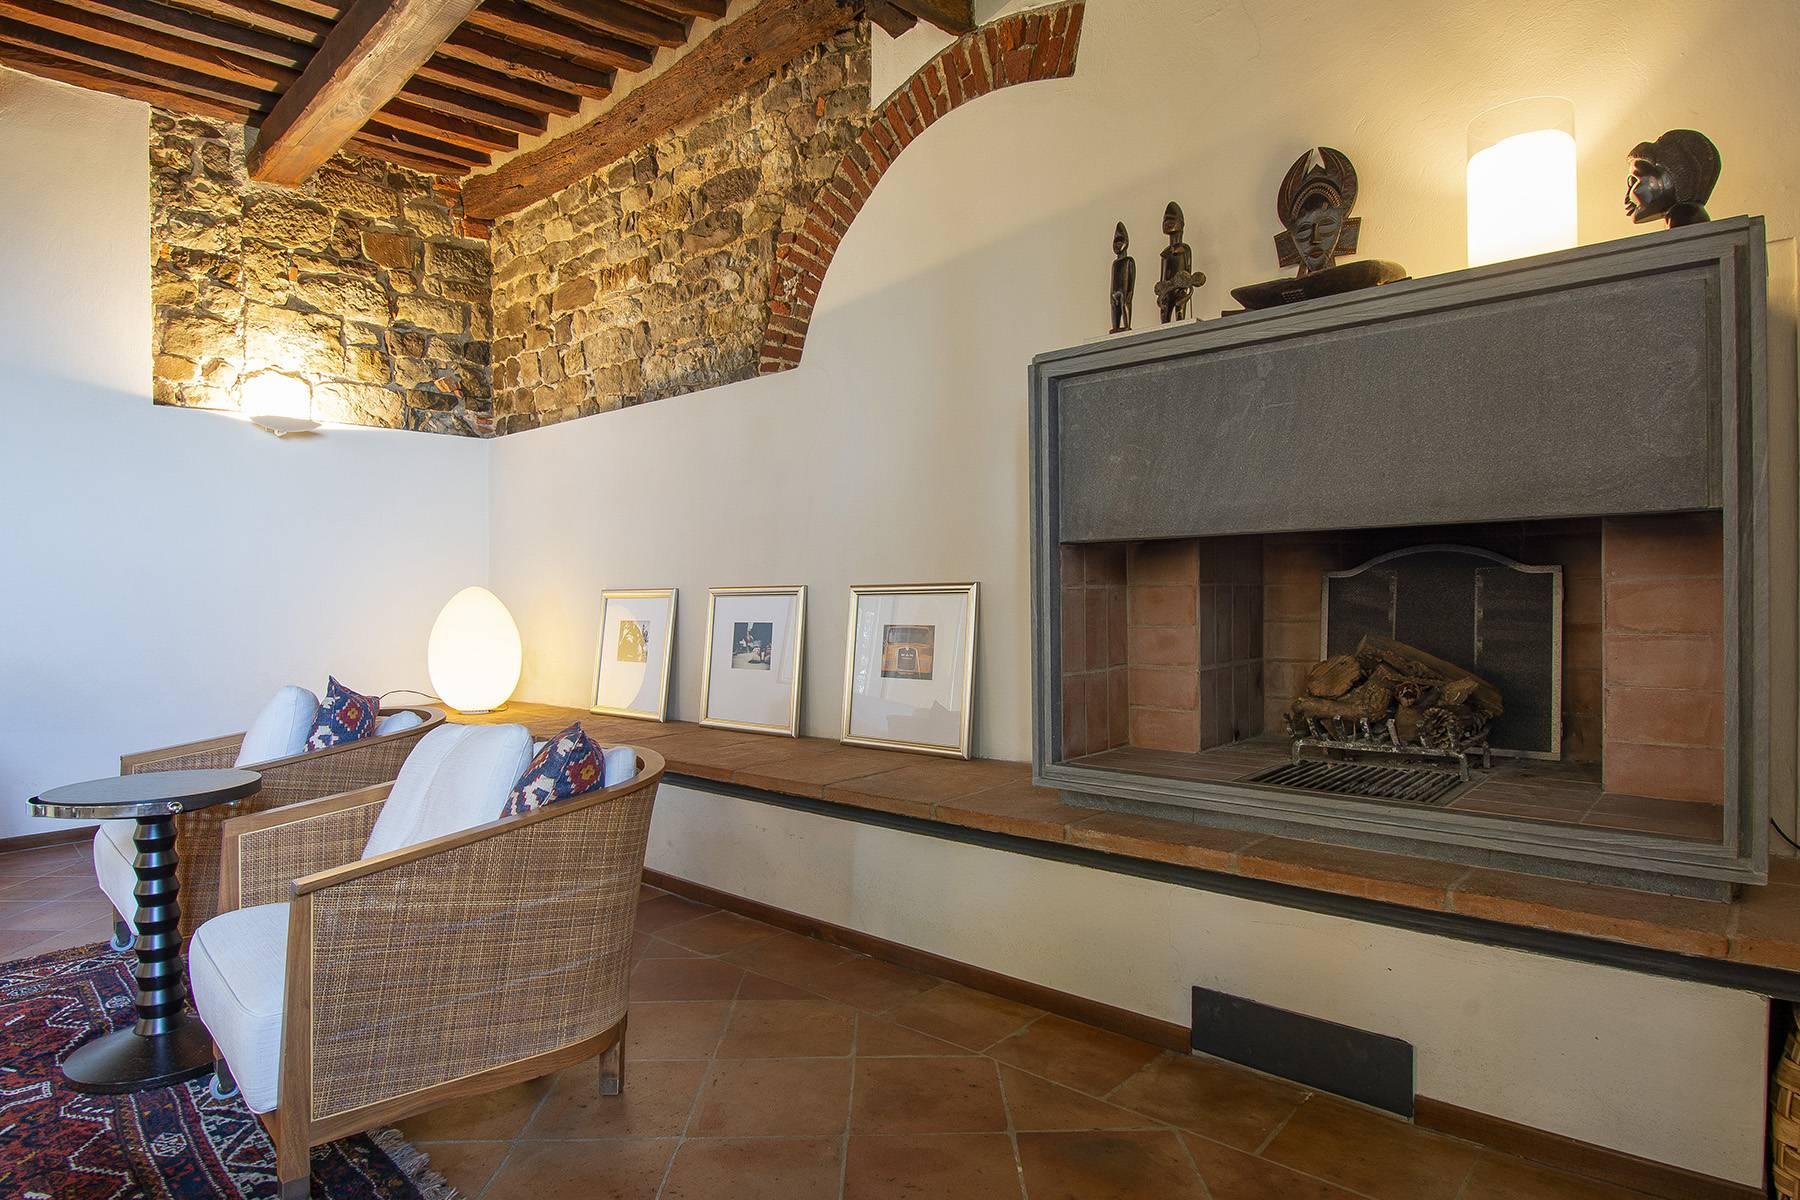 Villa in Vendita a Capannori: 5 locali, 380 mq - Foto 5